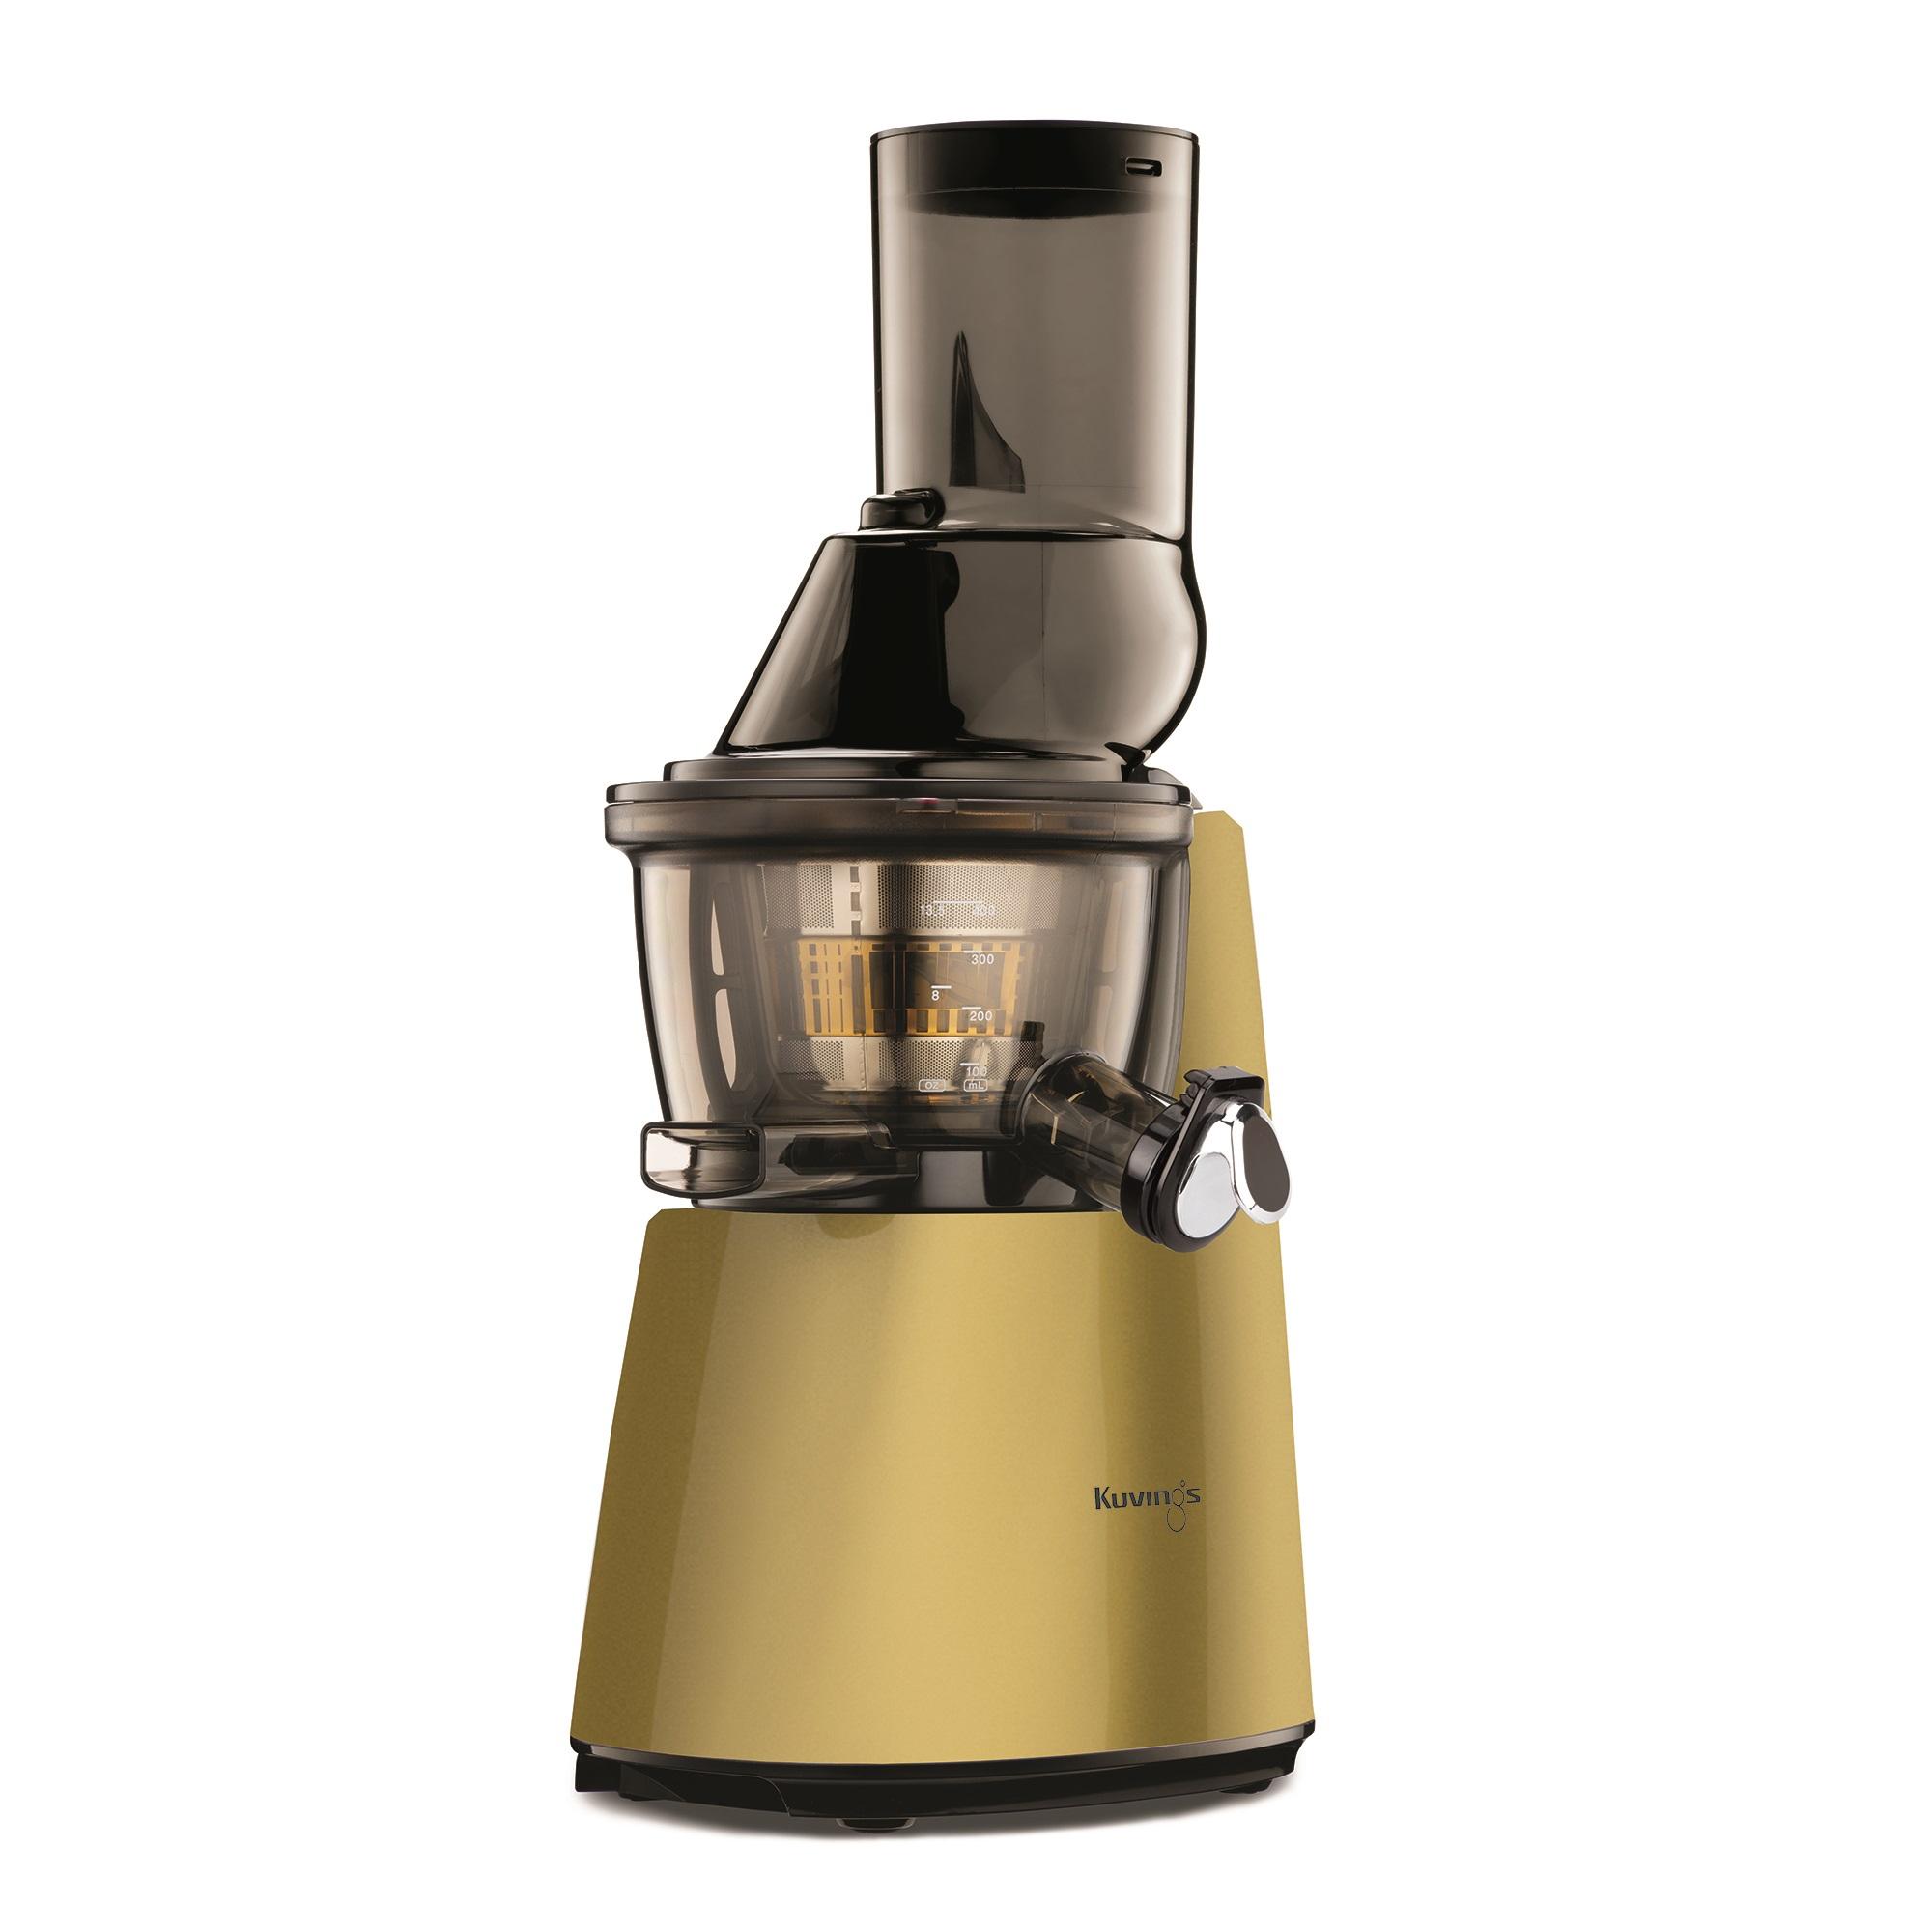 Idea Regalo  - Estrattore Kuvings Whole Slow Juicer